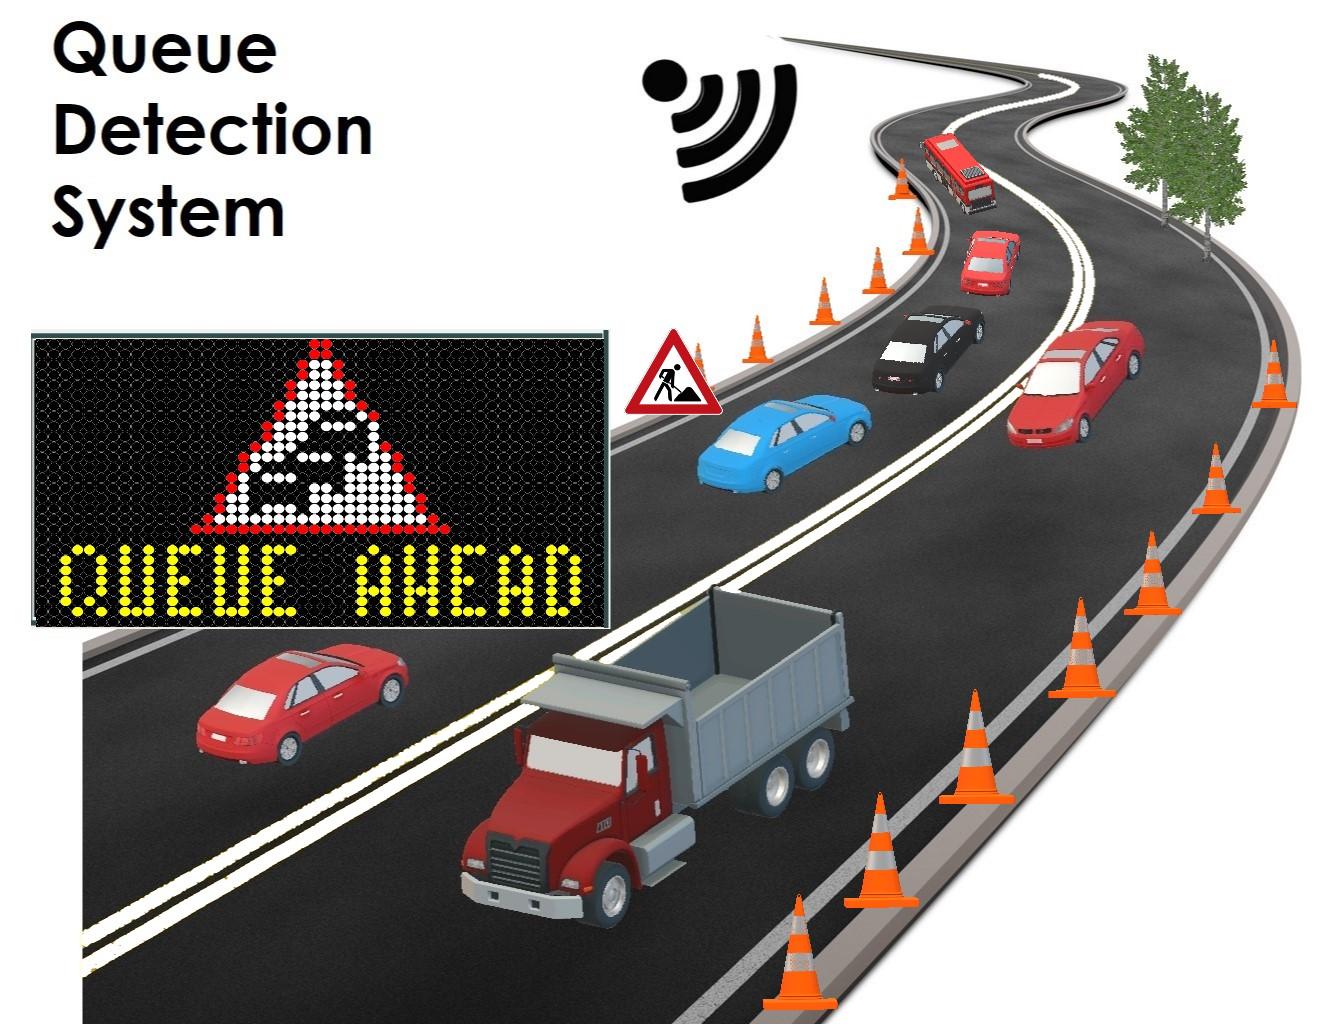 Queue detection system